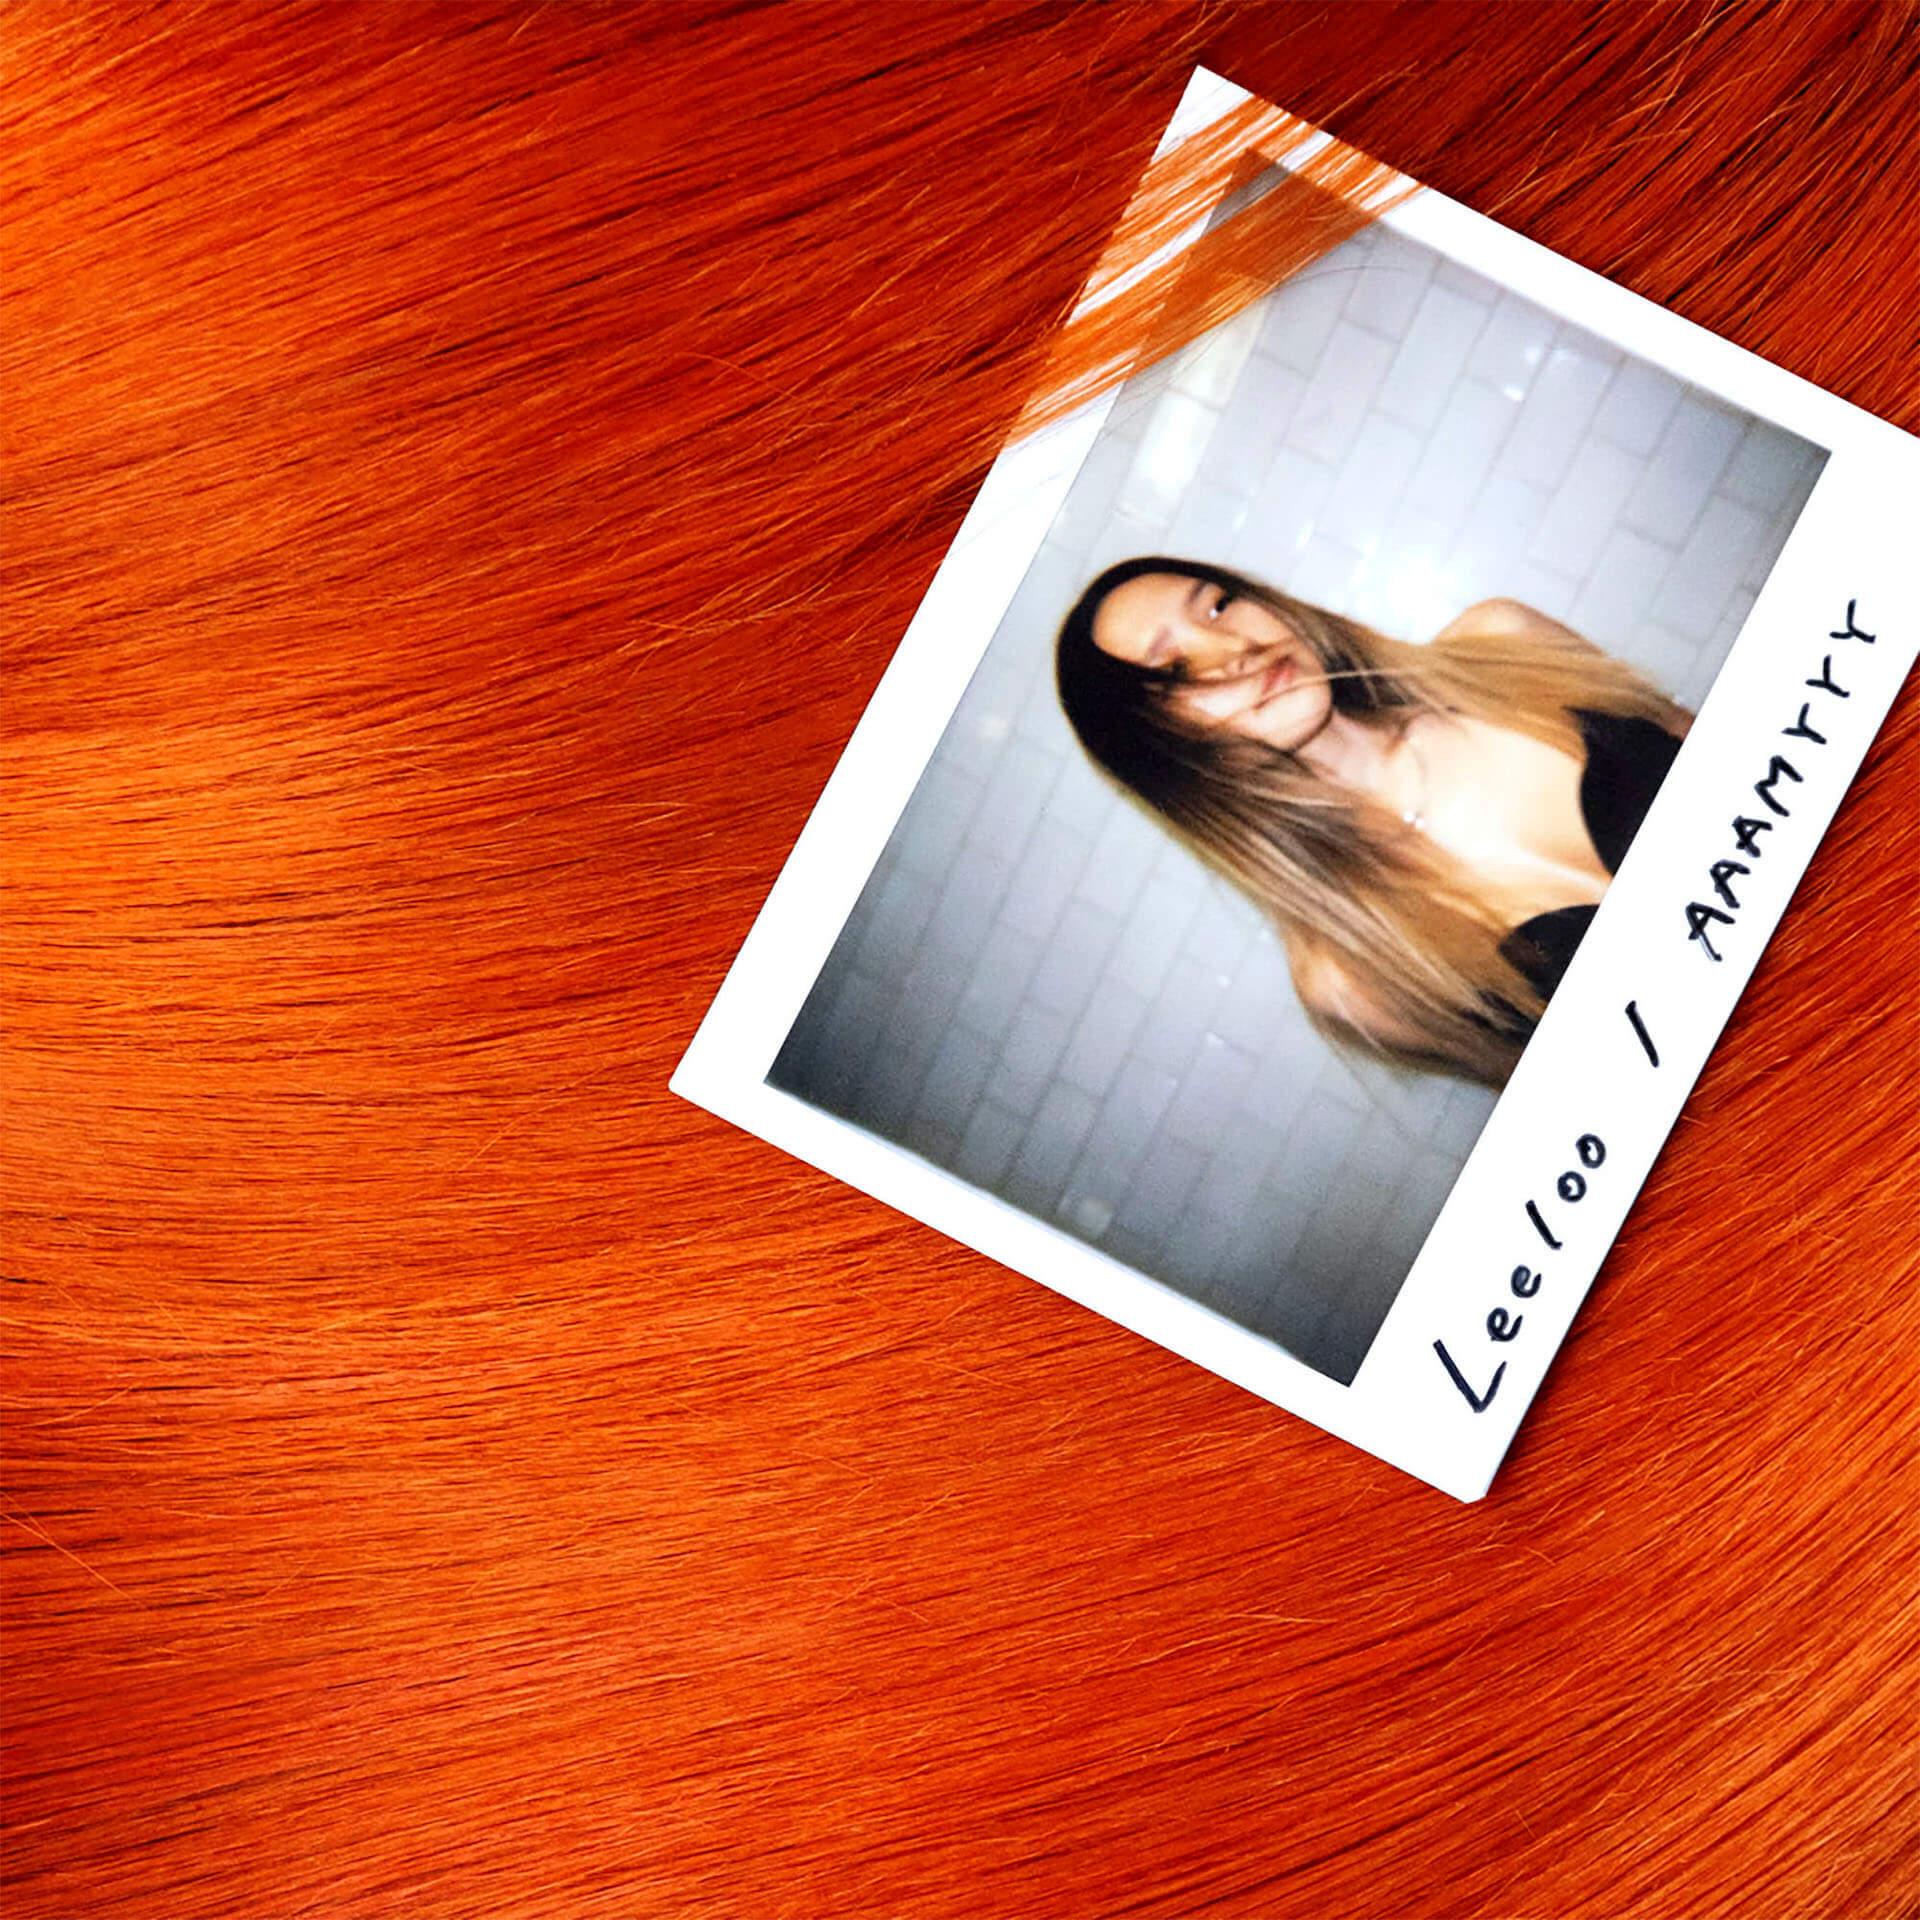 "AAAMYYYがTENDREらを迎えた新曲""Leeloo""を配信リリース&ジャケ写公開!SONAR MUSICで初オンエア music200707_aaamyyy_02"